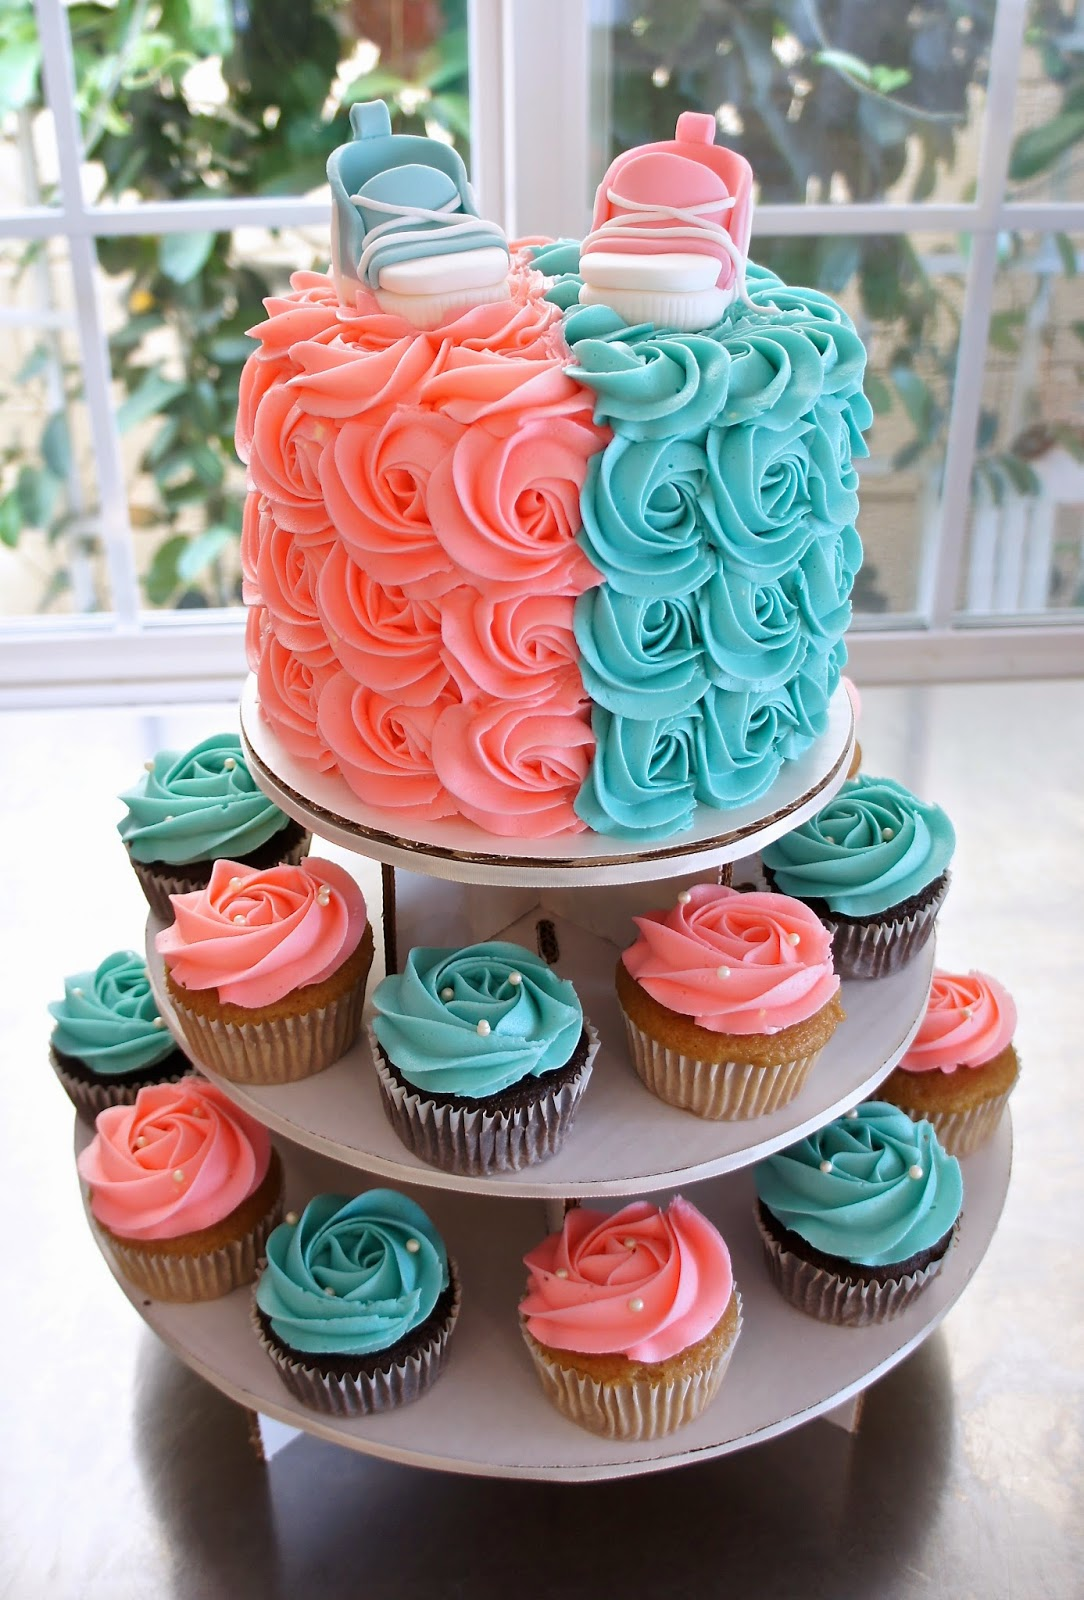 Cupcake Towers - Burbank CA